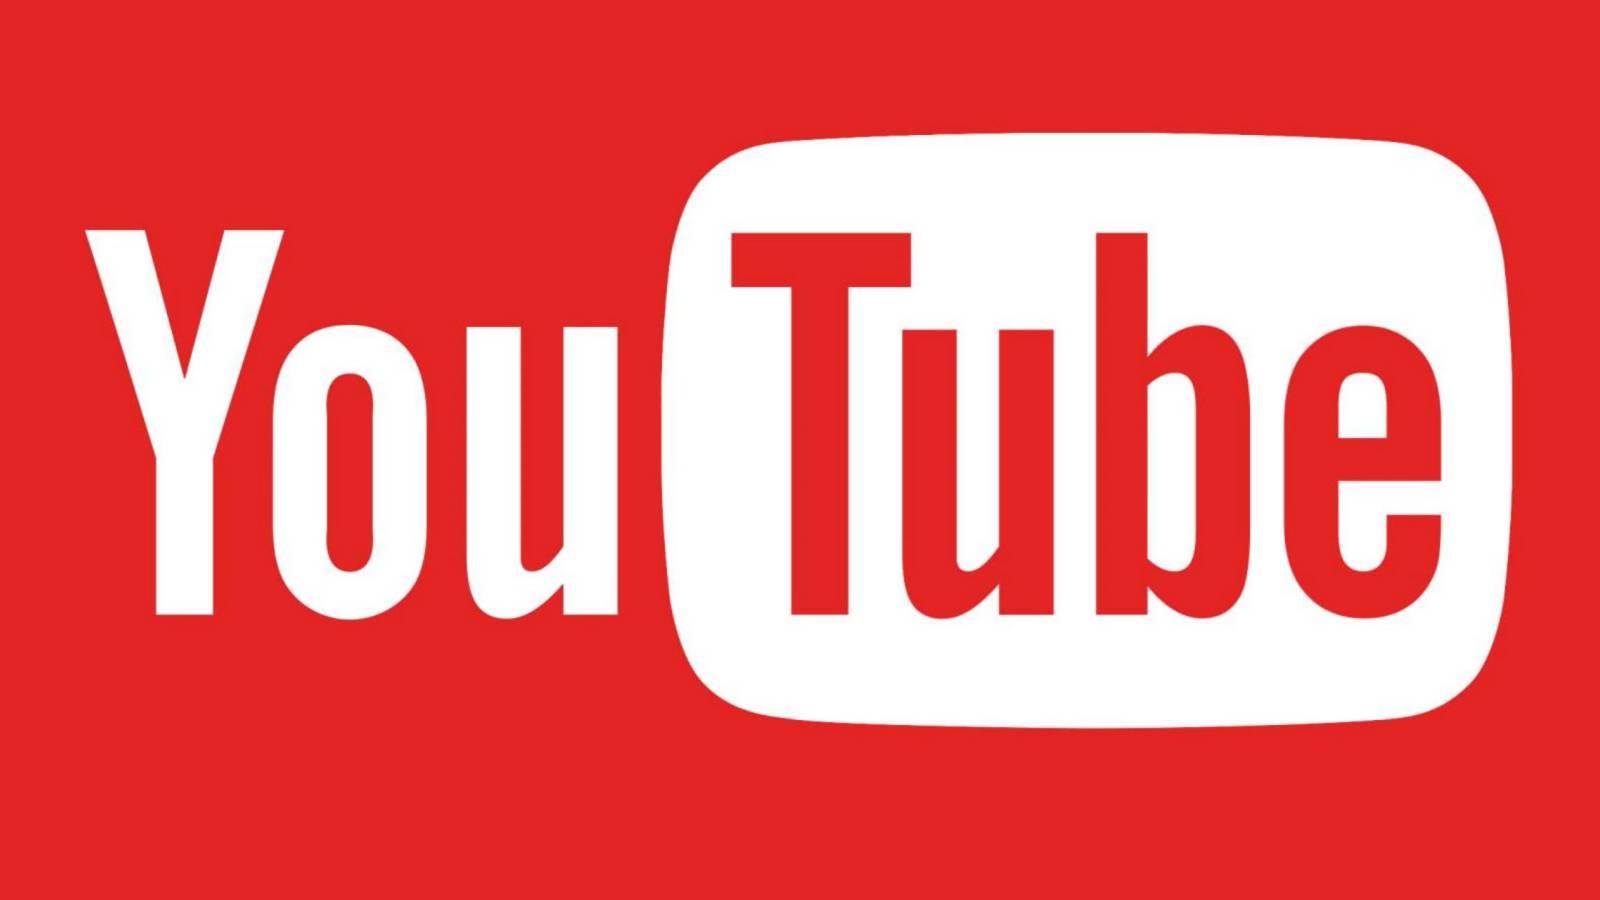 YouTube Noul Update si Schimbarile din Telefoane, Tablete